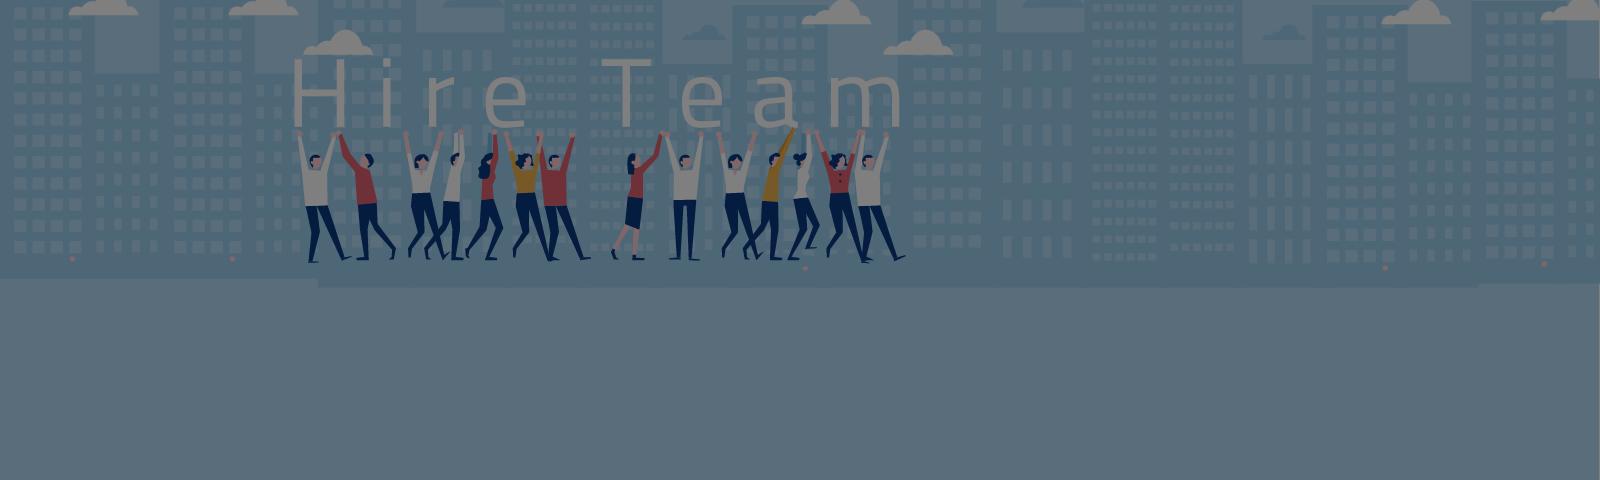 Hire dedicated team